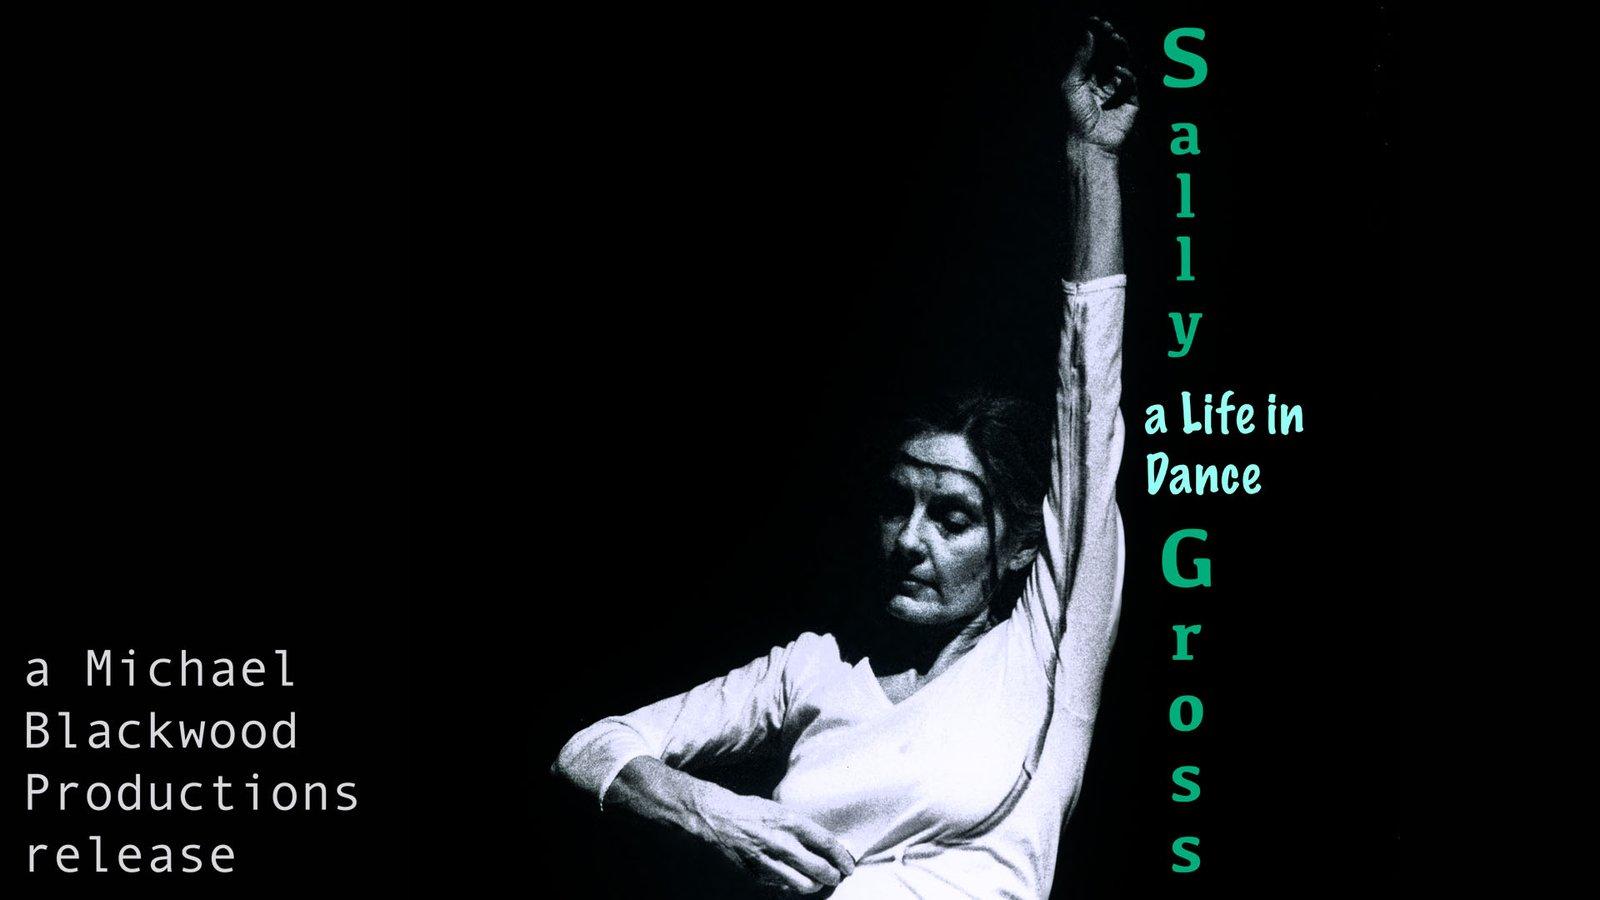 Sally Gross - A Life in Dance